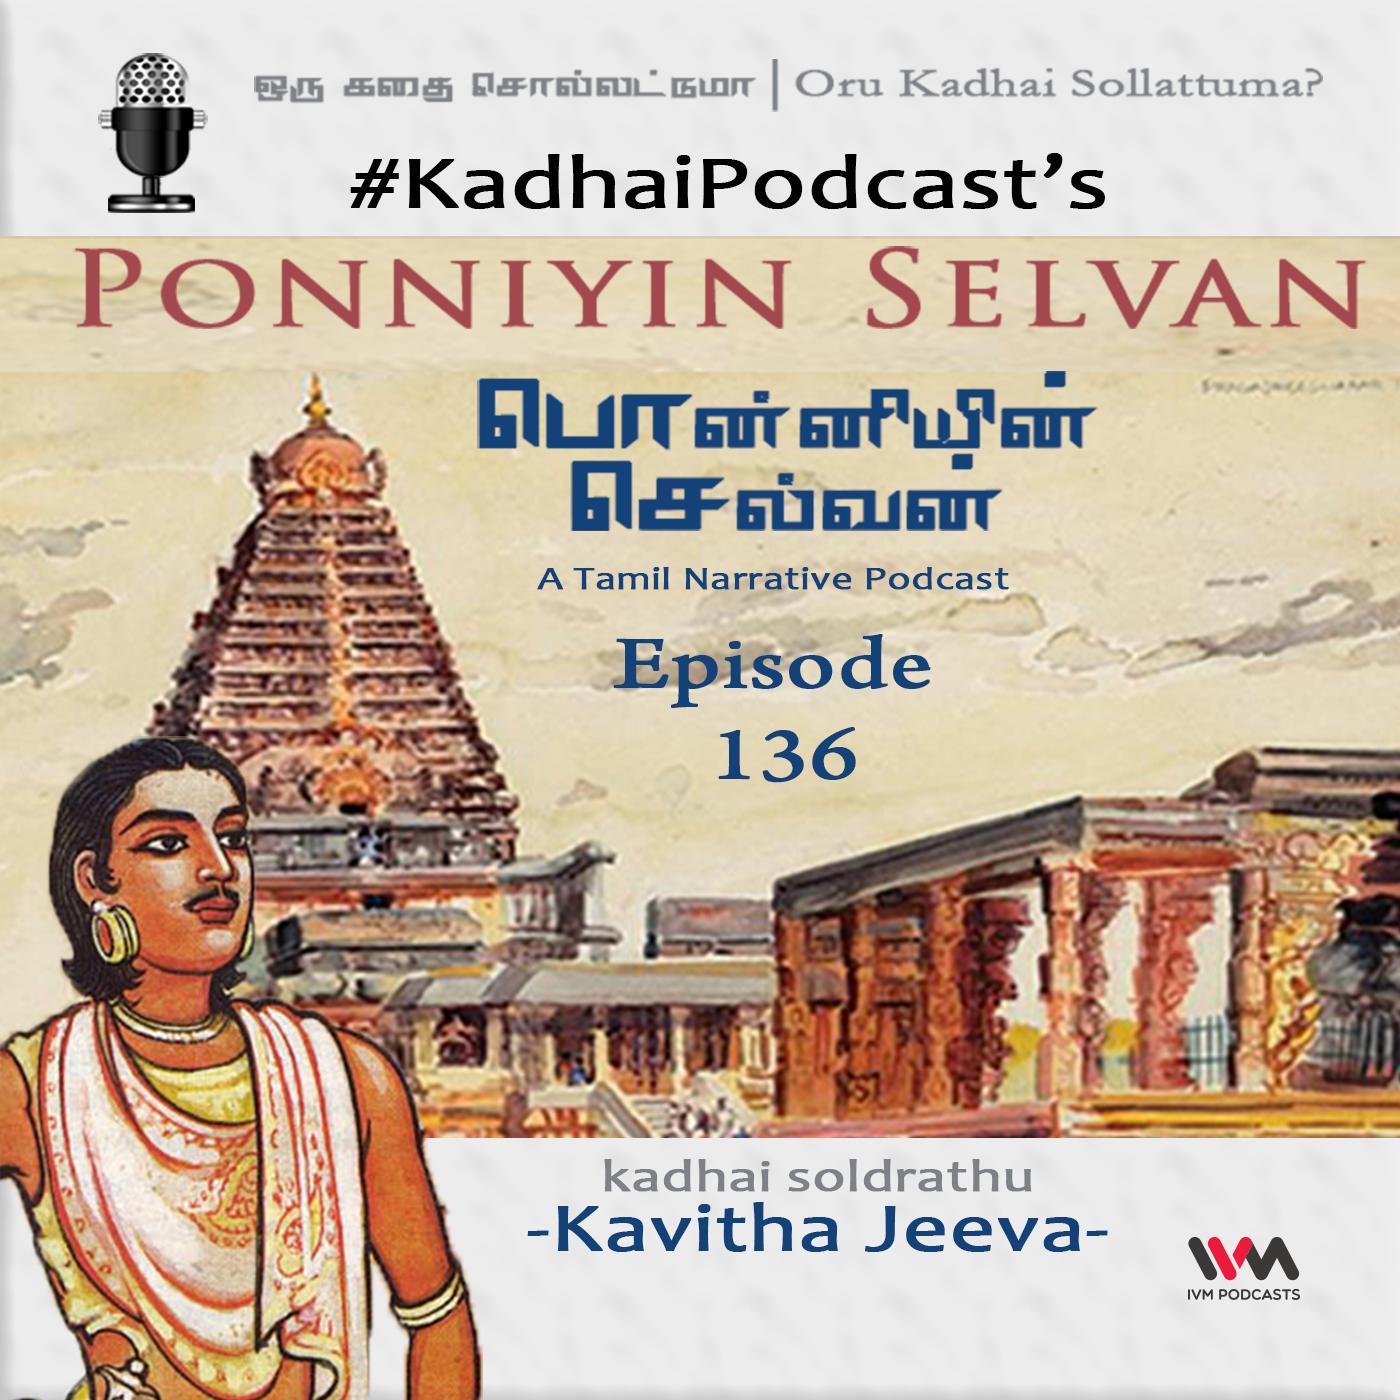 KadhaiPodcast's Ponniyin Selvan - Episode # 136